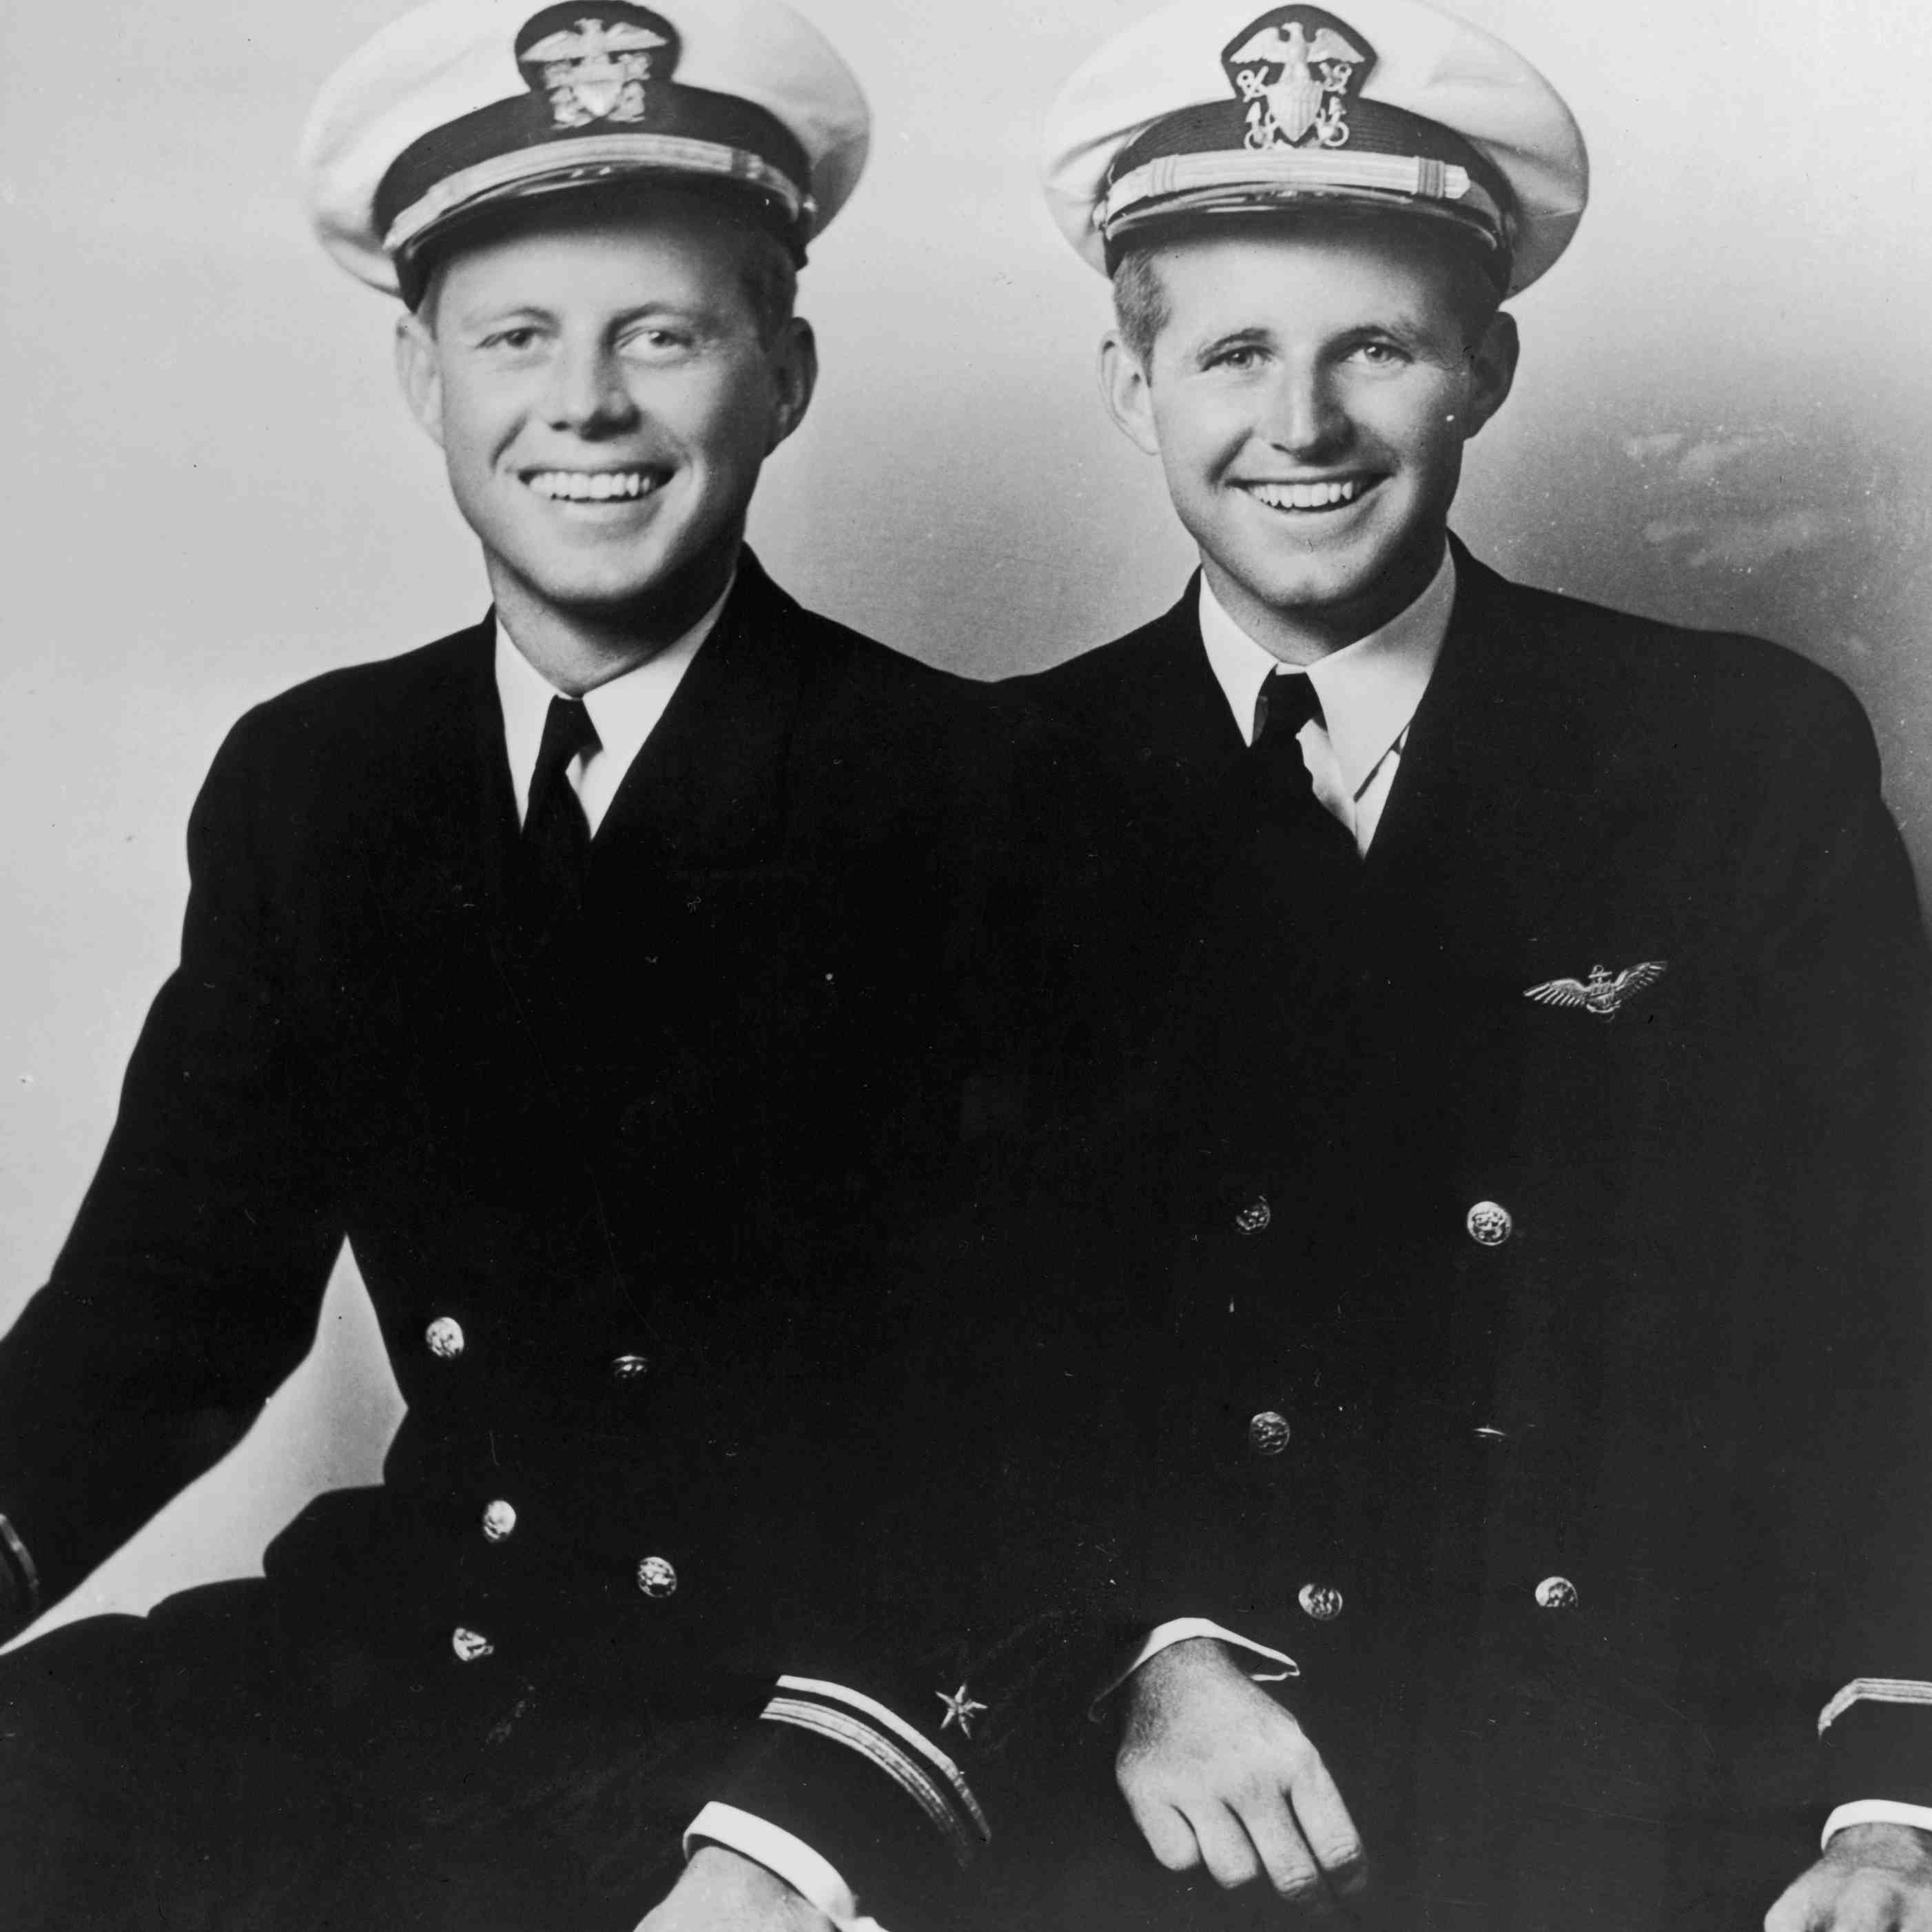 John F. Kennedy sitting next to his brother Joseph Kennedy Jr